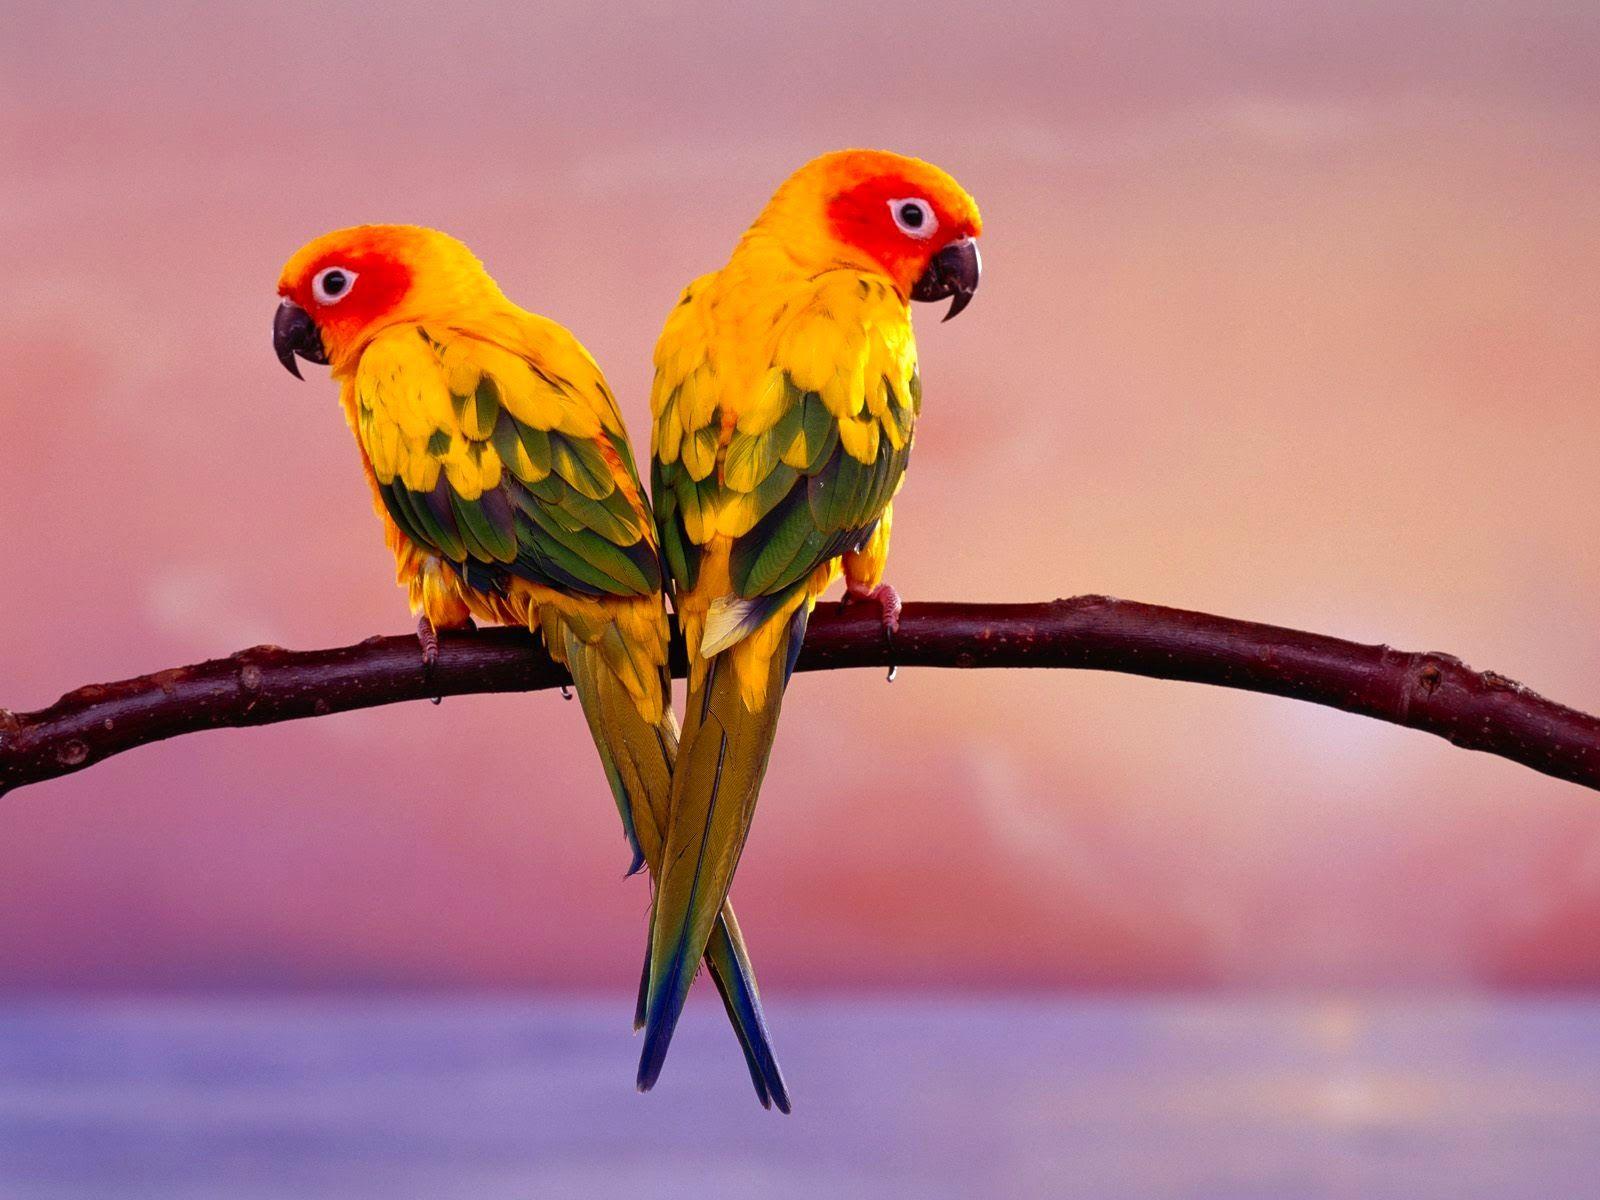 Beautiful Hd Wallpapers Wallpaper For Desktop Beautiful Bird Wallpaper Pet Birds Conure Parrots